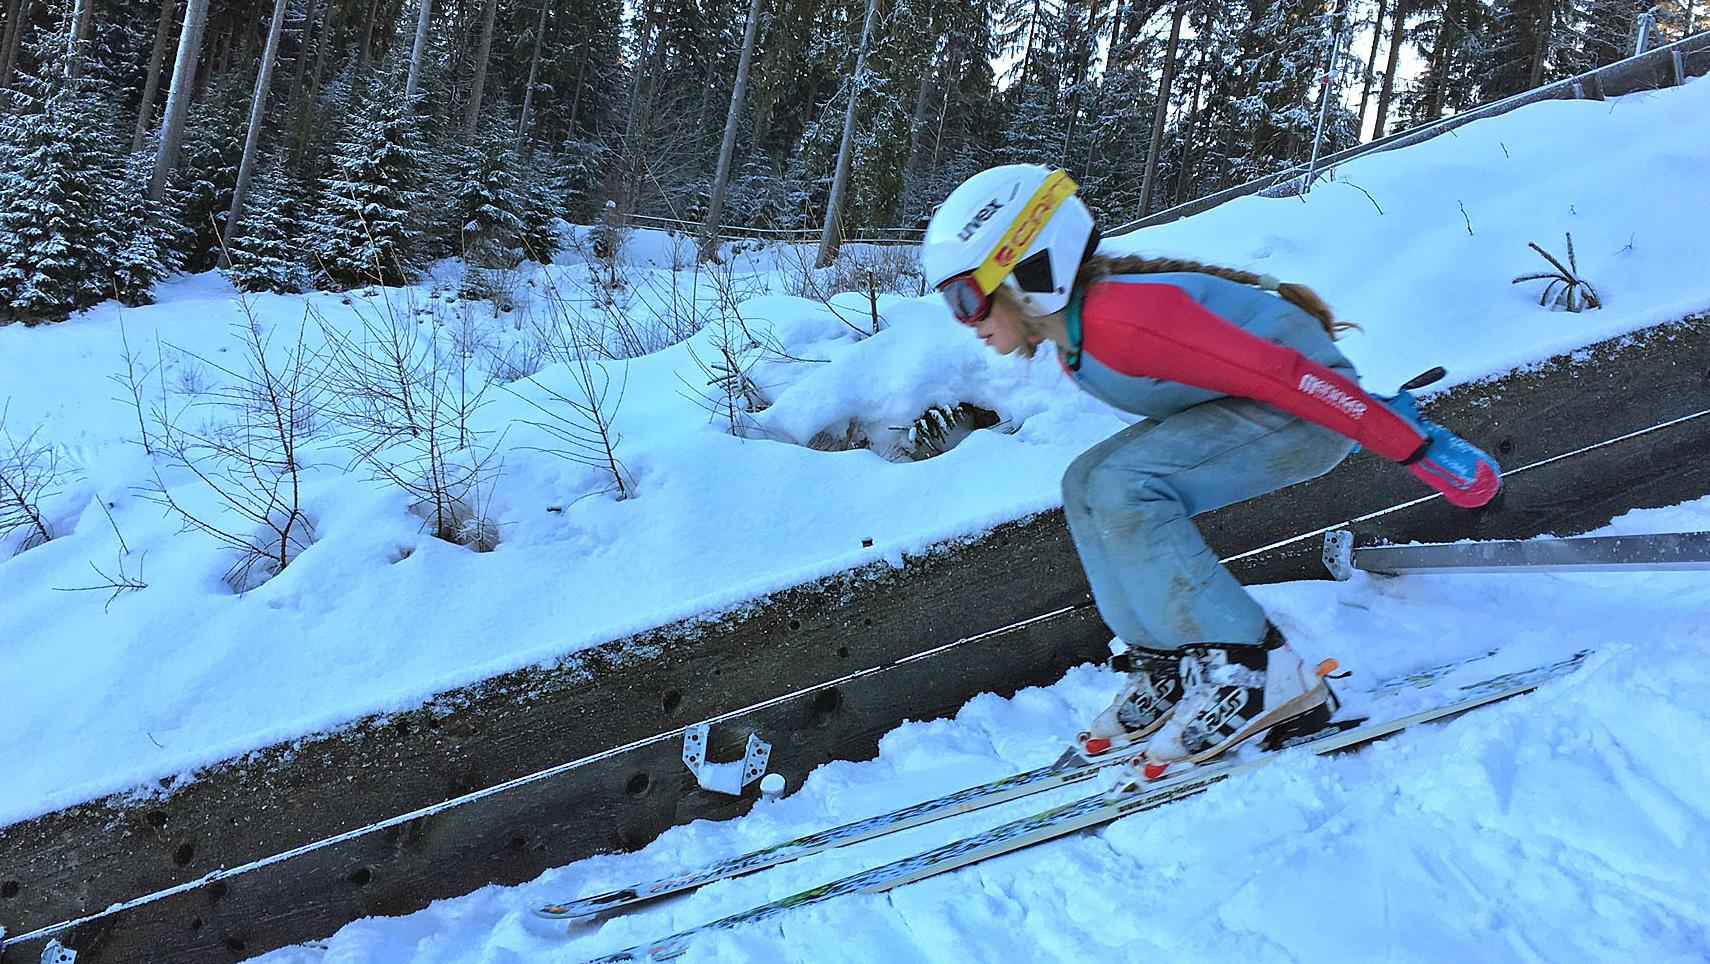 Kind beim Skispringen